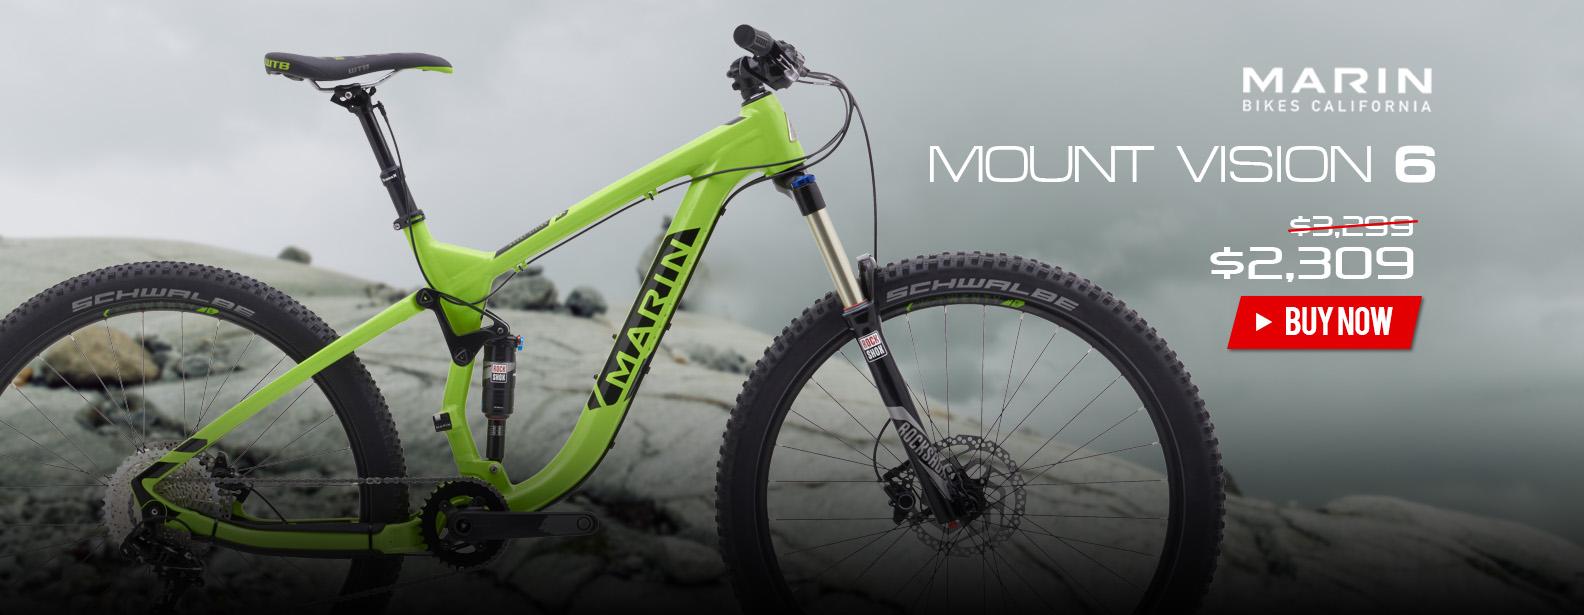 Marin Mount Vision 6 Bike